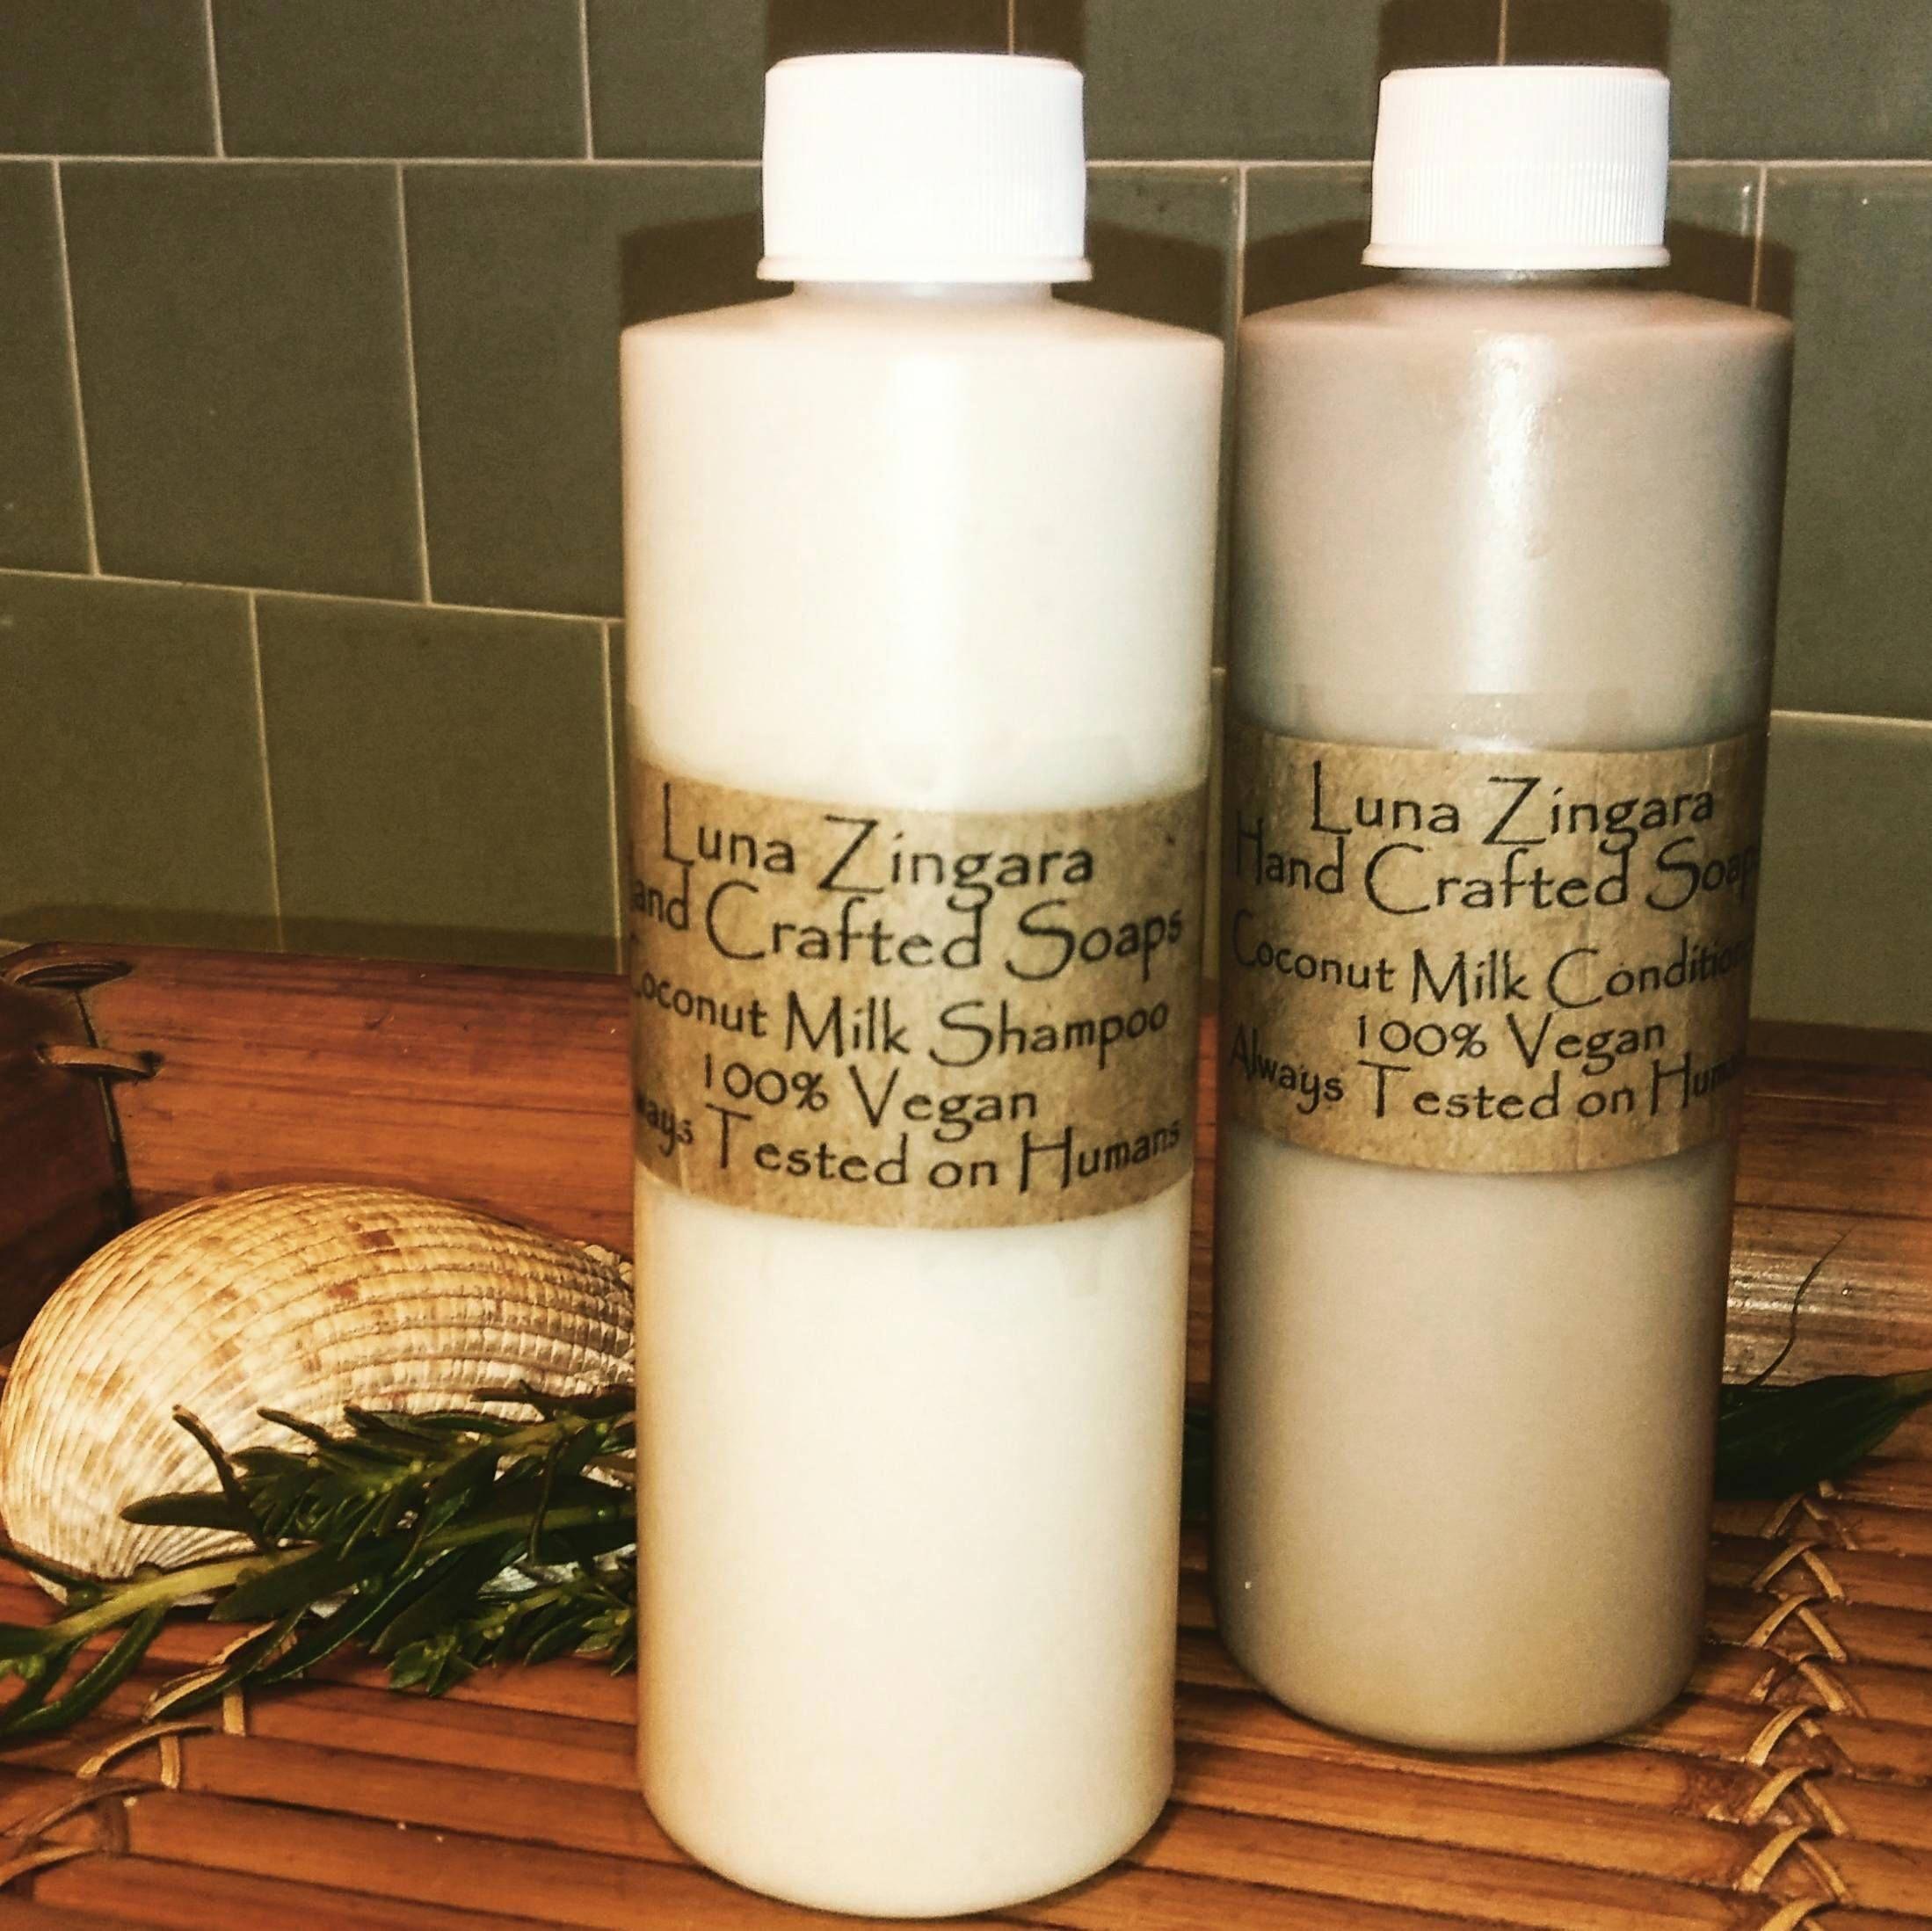 Natural Shampoo and Conditioner. Cruelty free, coconut